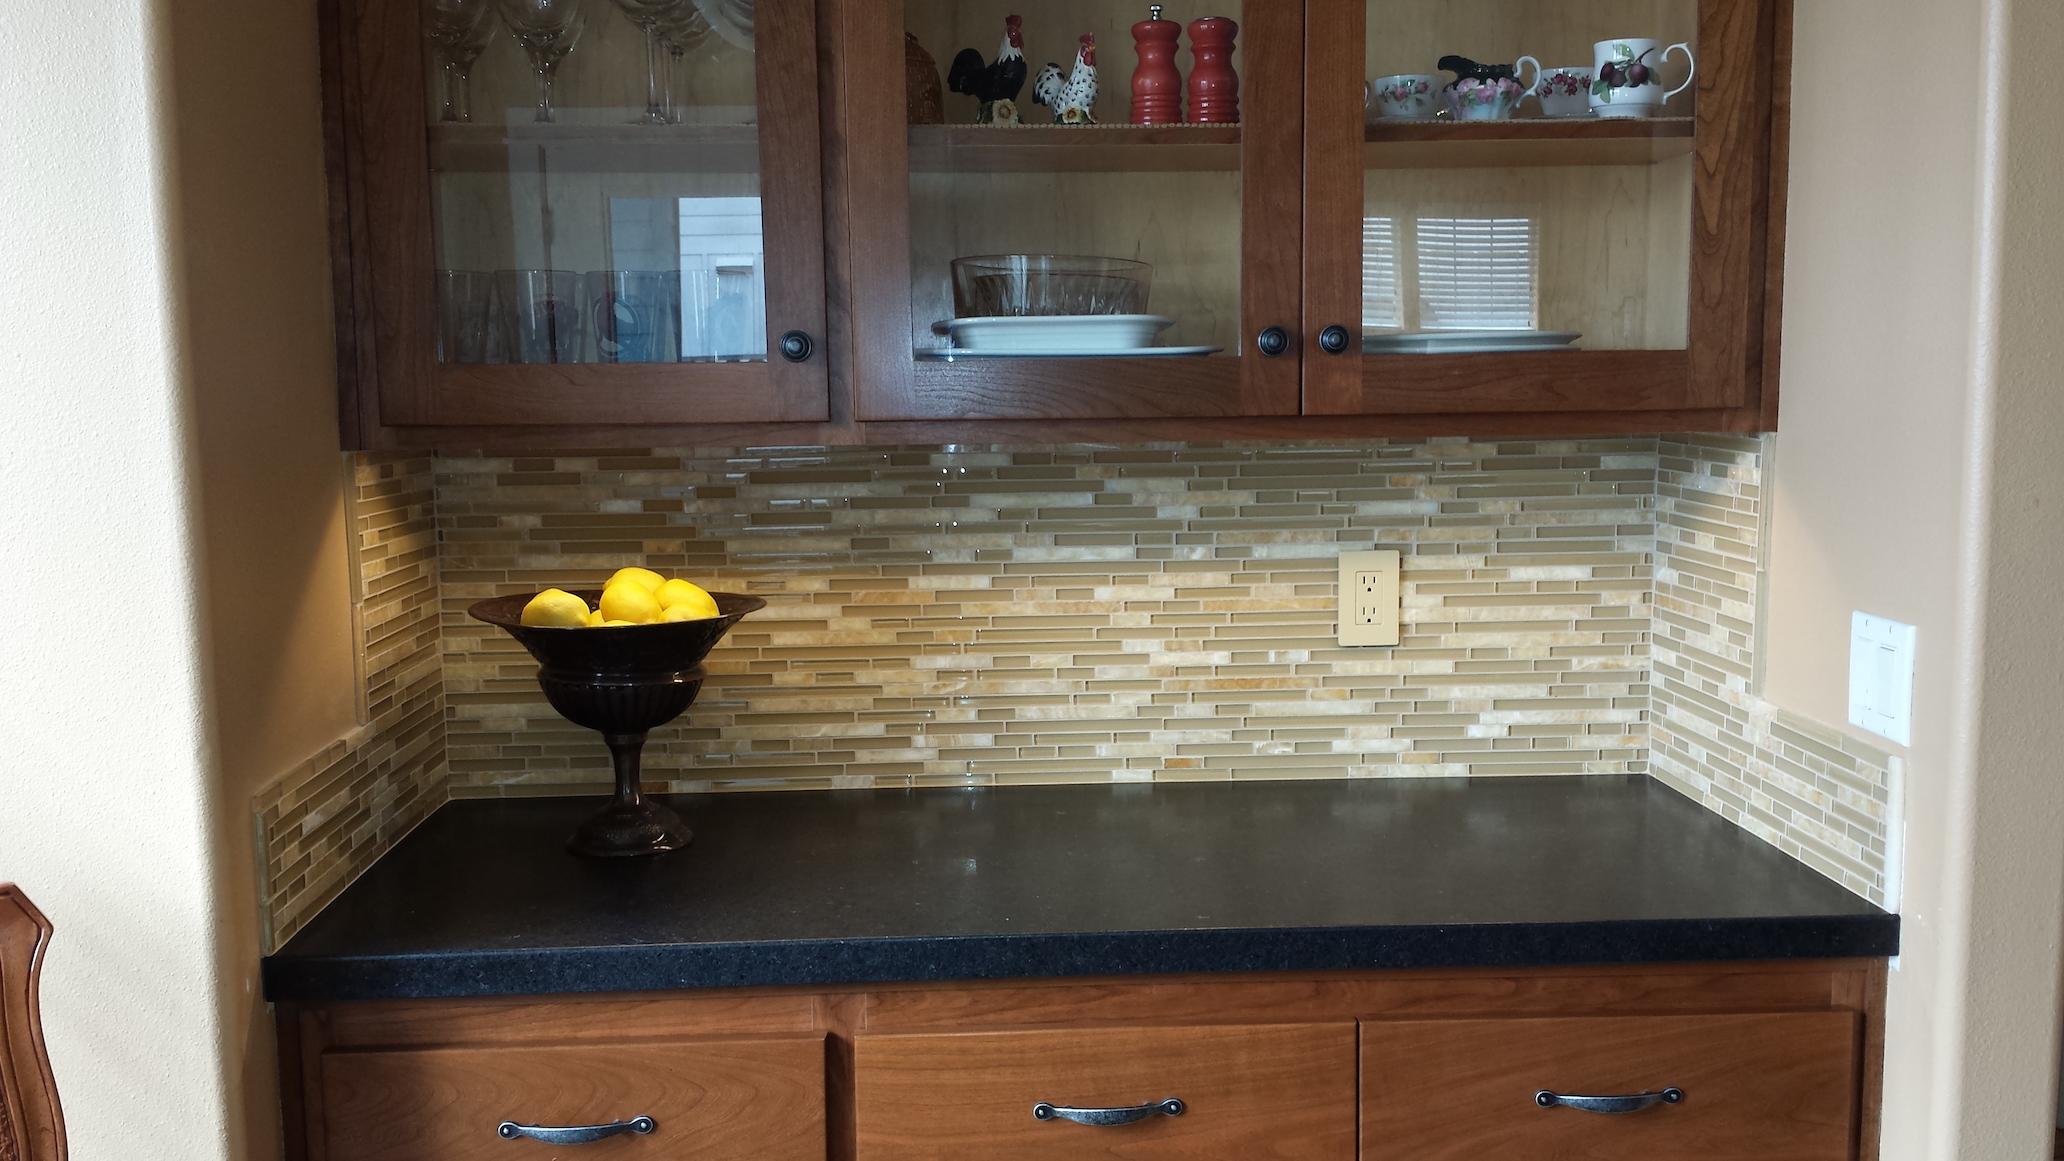 kitchen counter lighting kitchen led lighting LED Dimmable UC lights LED Kitchen Nook lighting